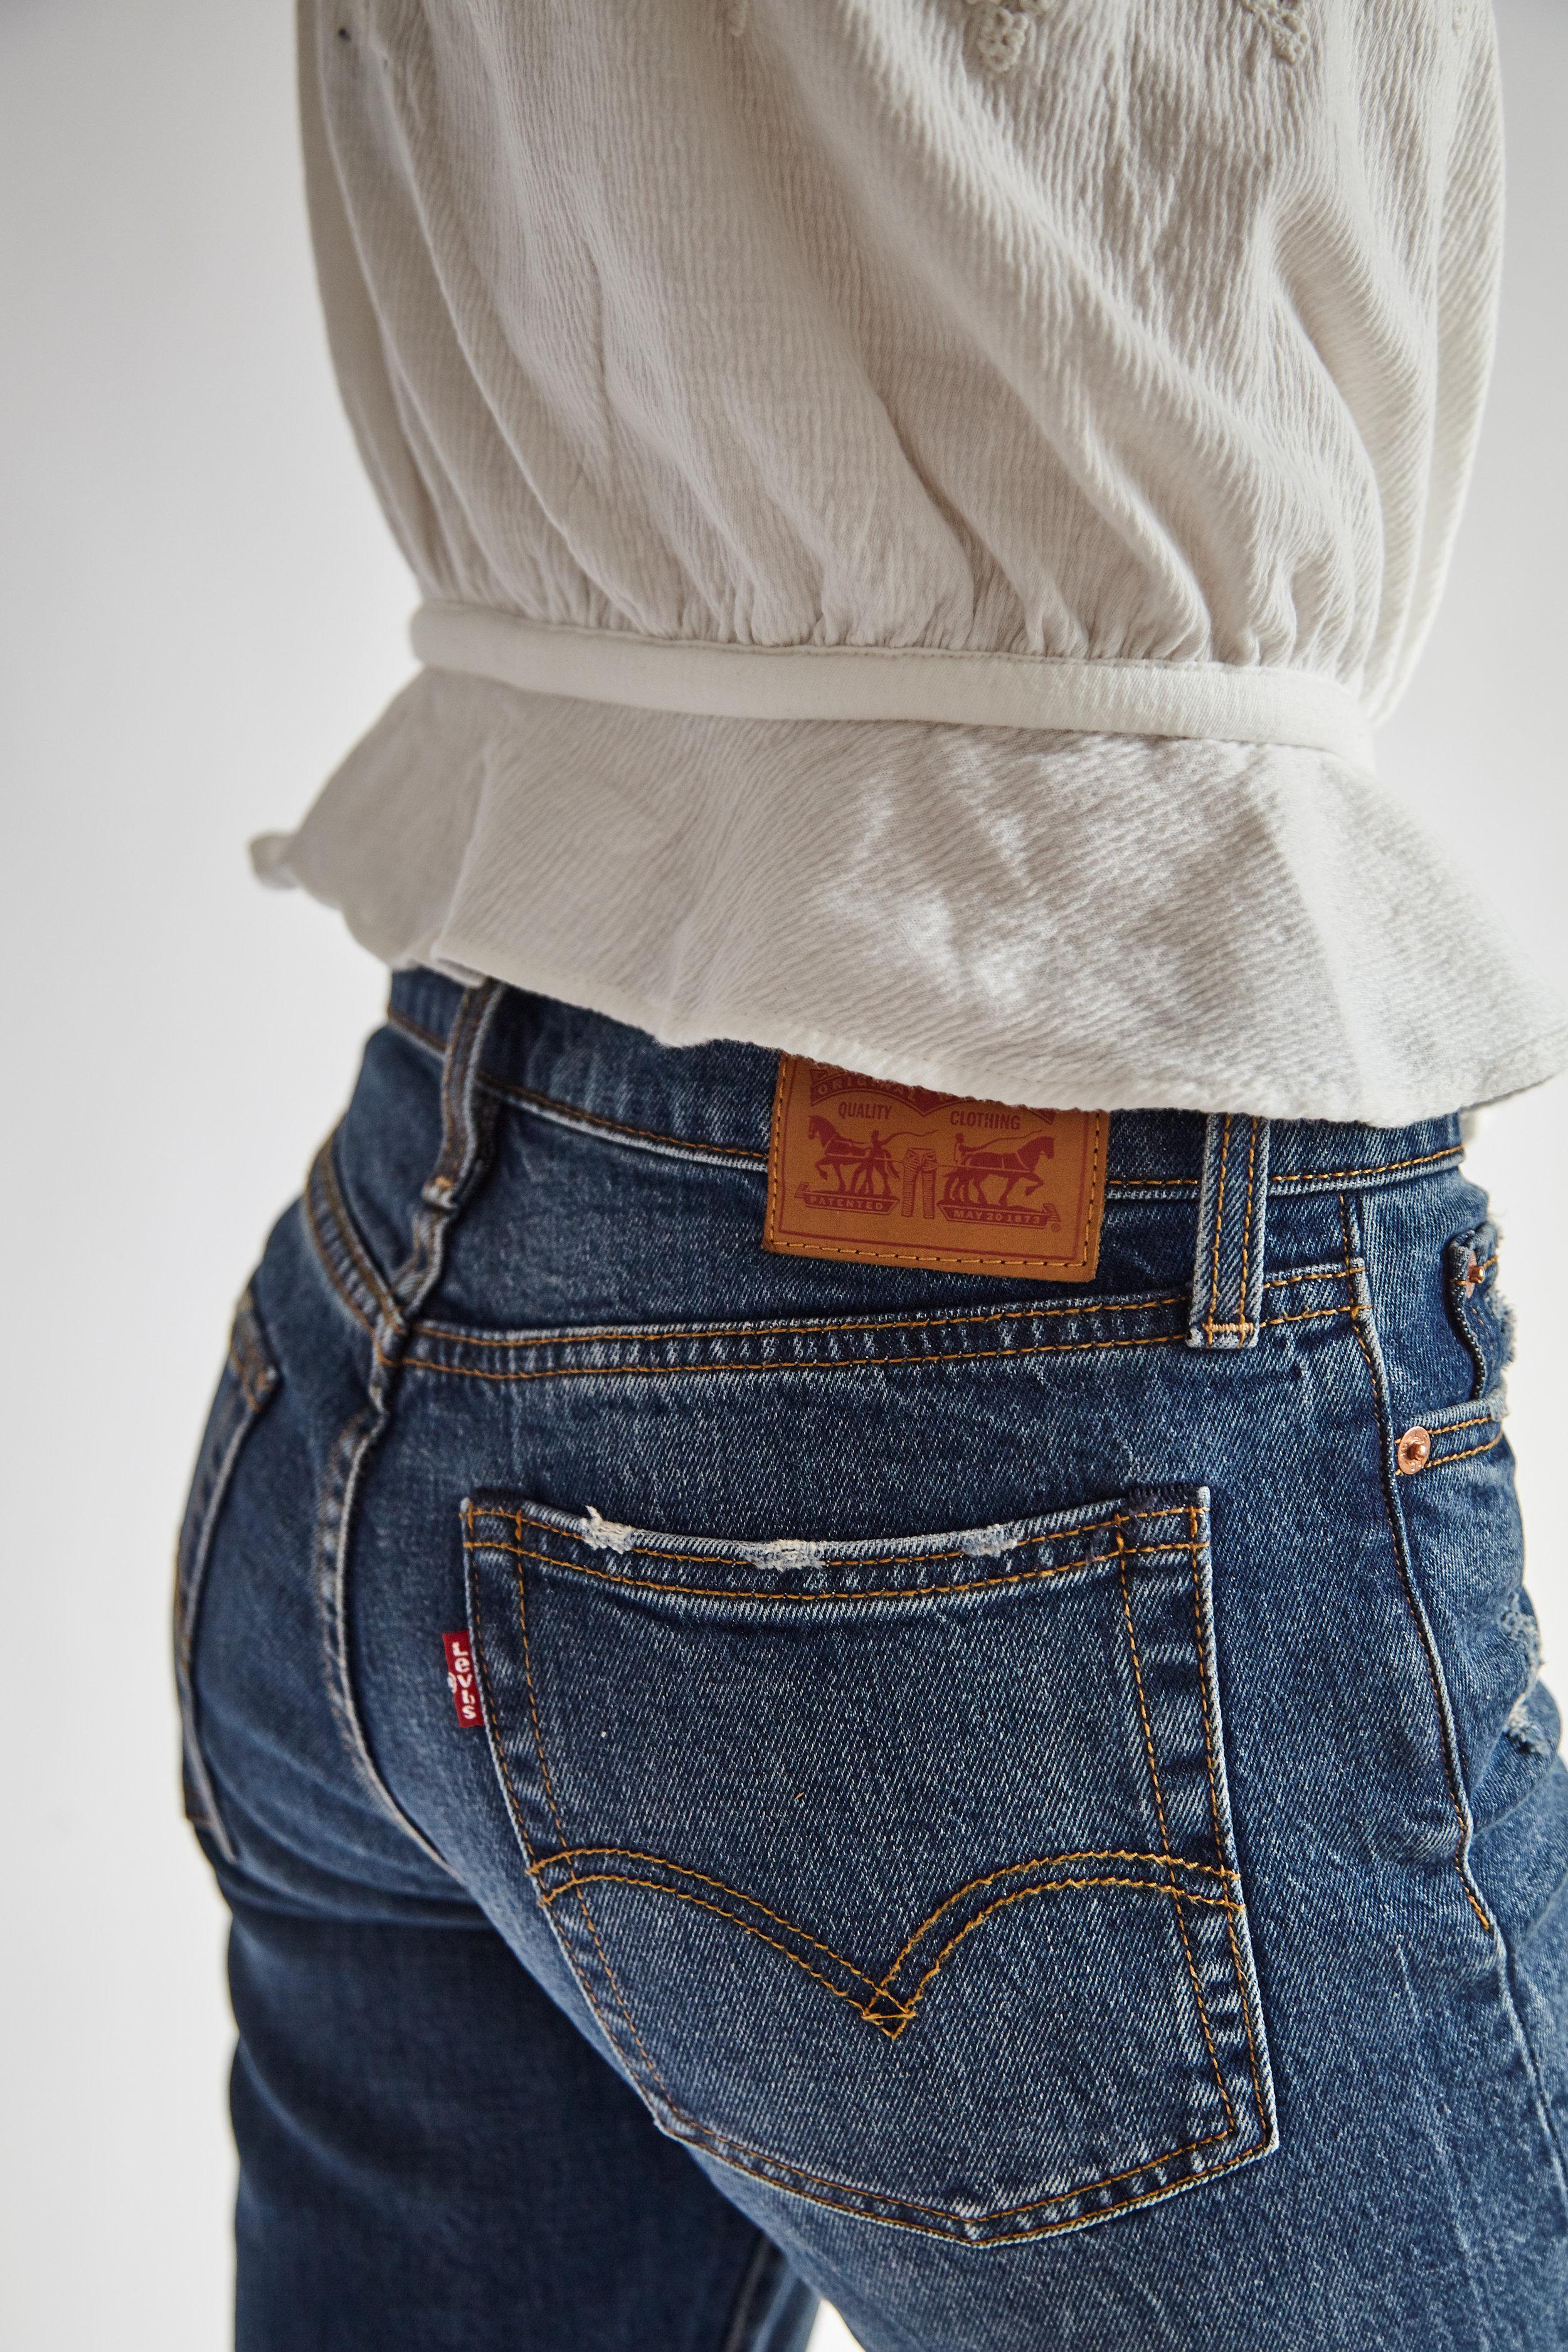 rosie_butcher_Levis_jeans_should_you_invest.jpg